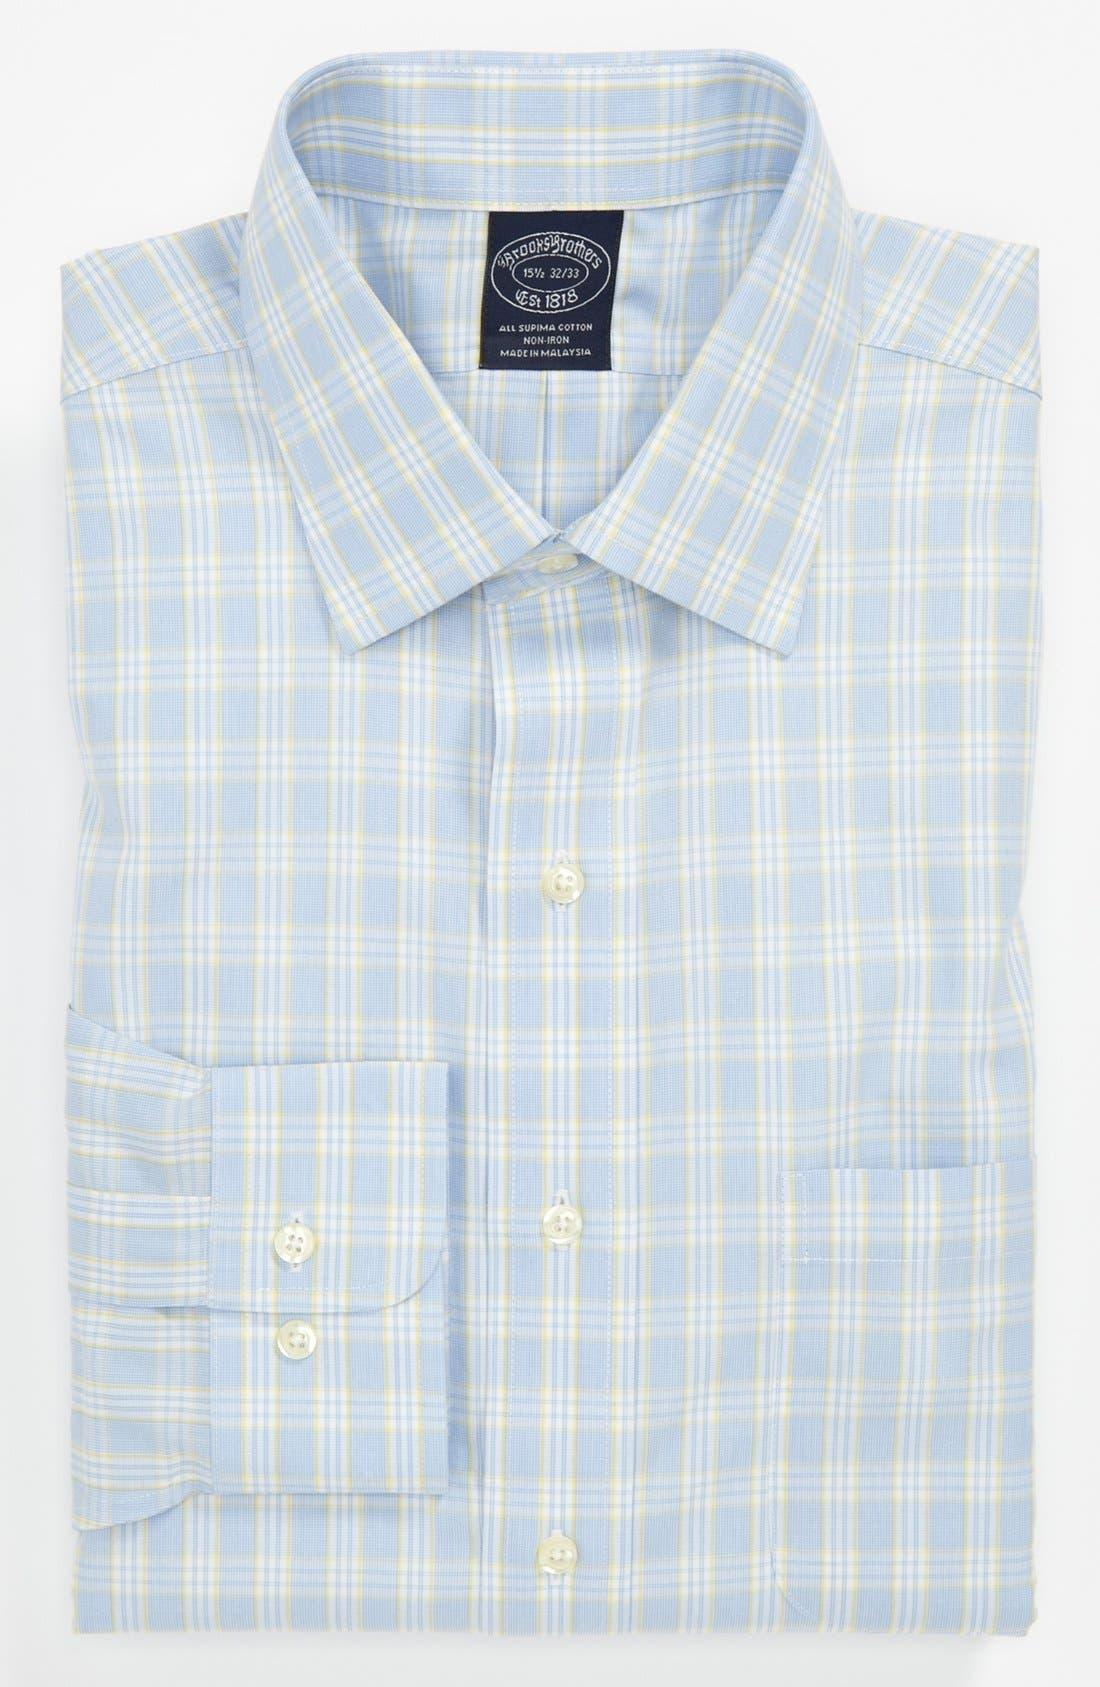 Main Image - Brooks Brothers Slim Fit Non-Iron Dress Shirt